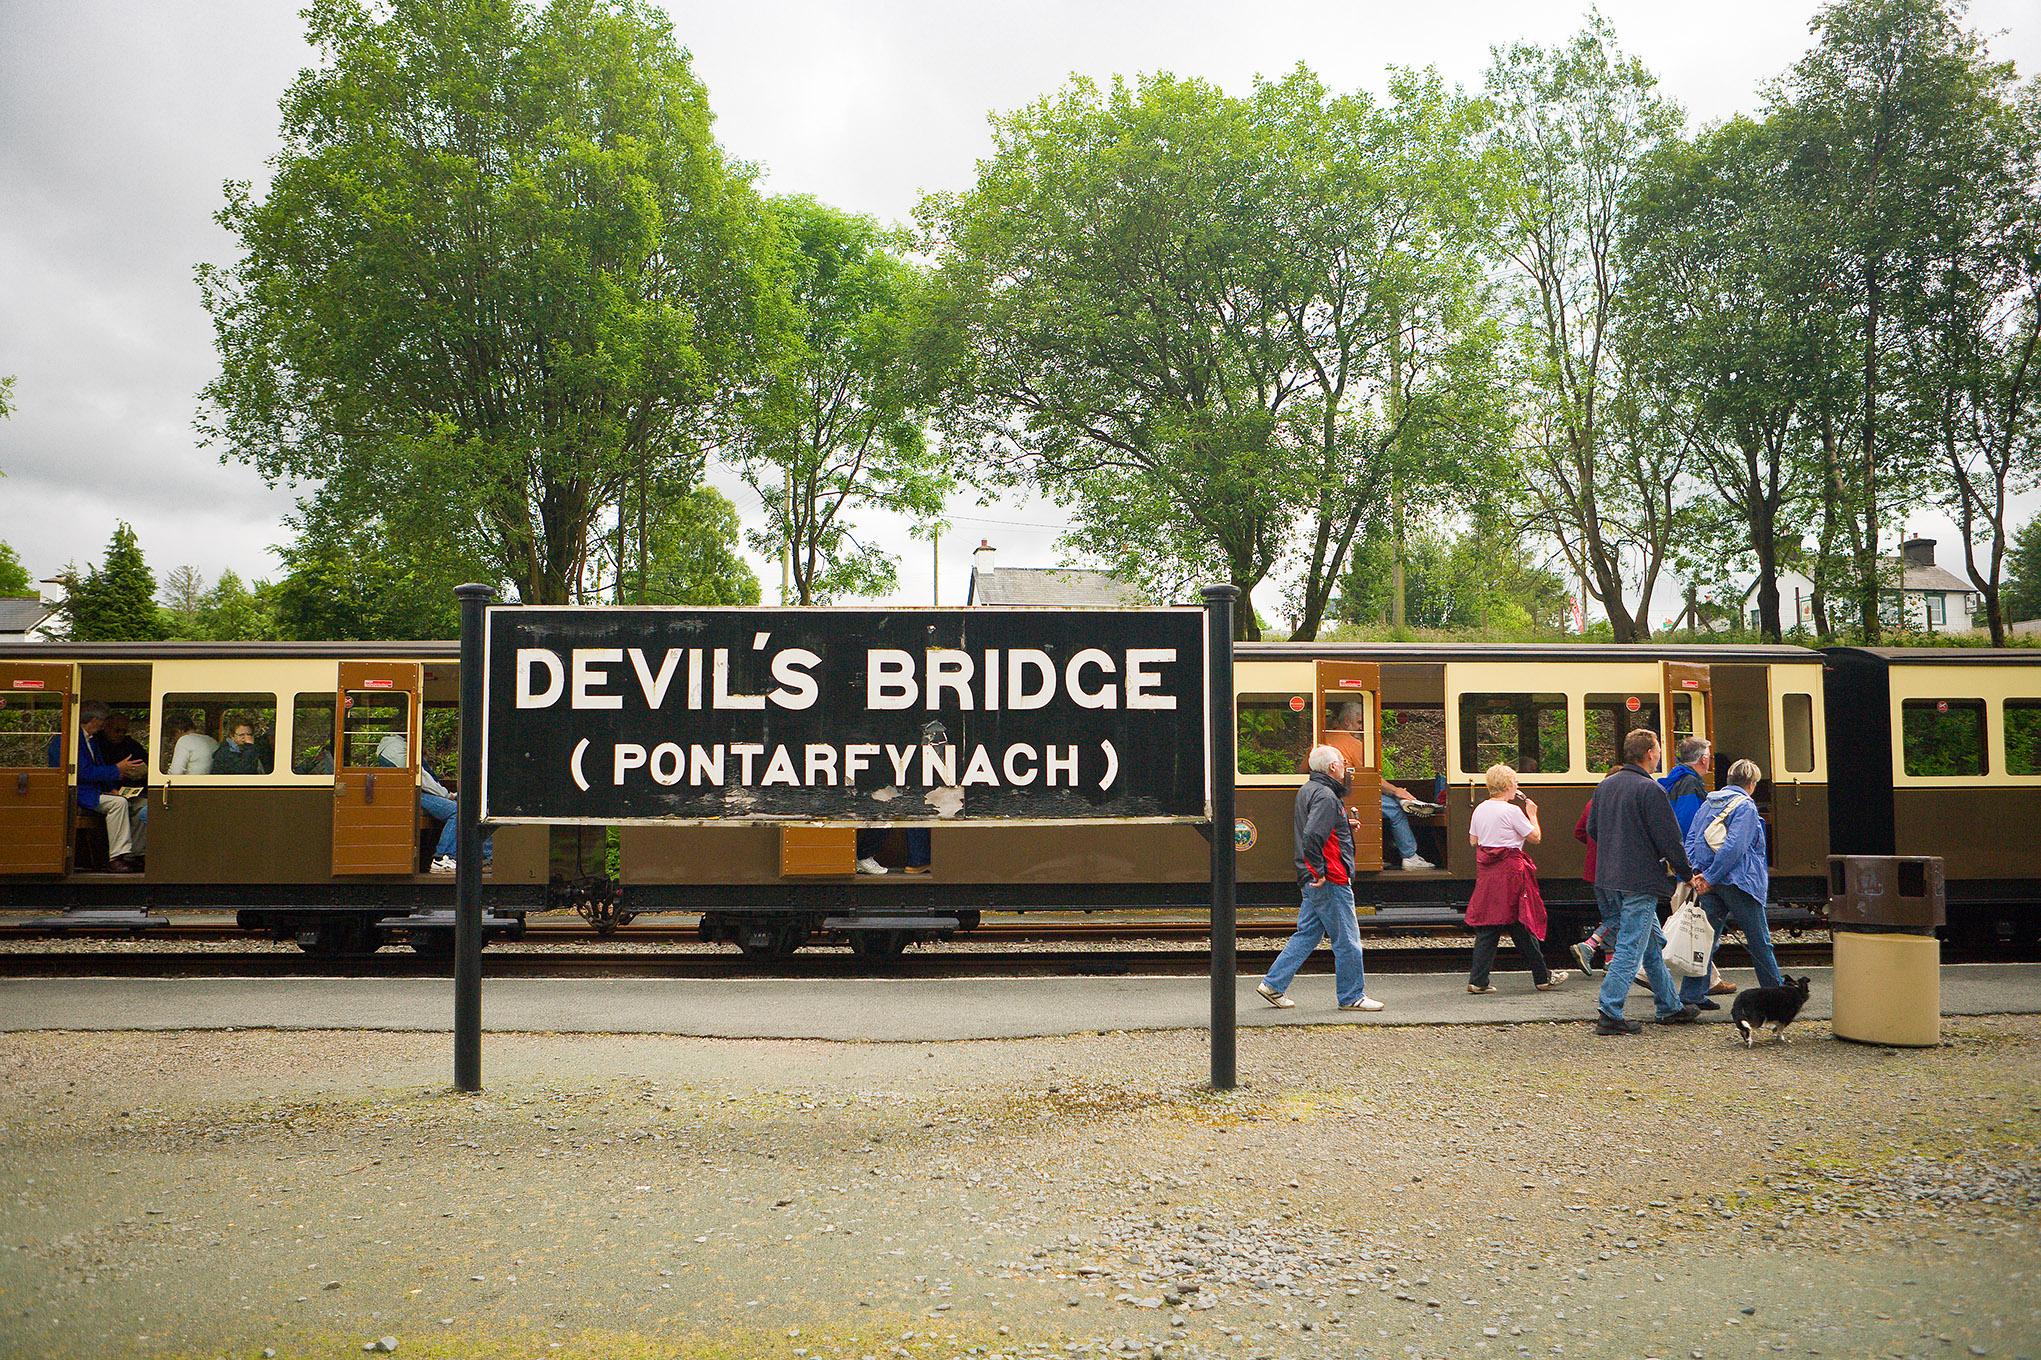 Devil's Bridge station